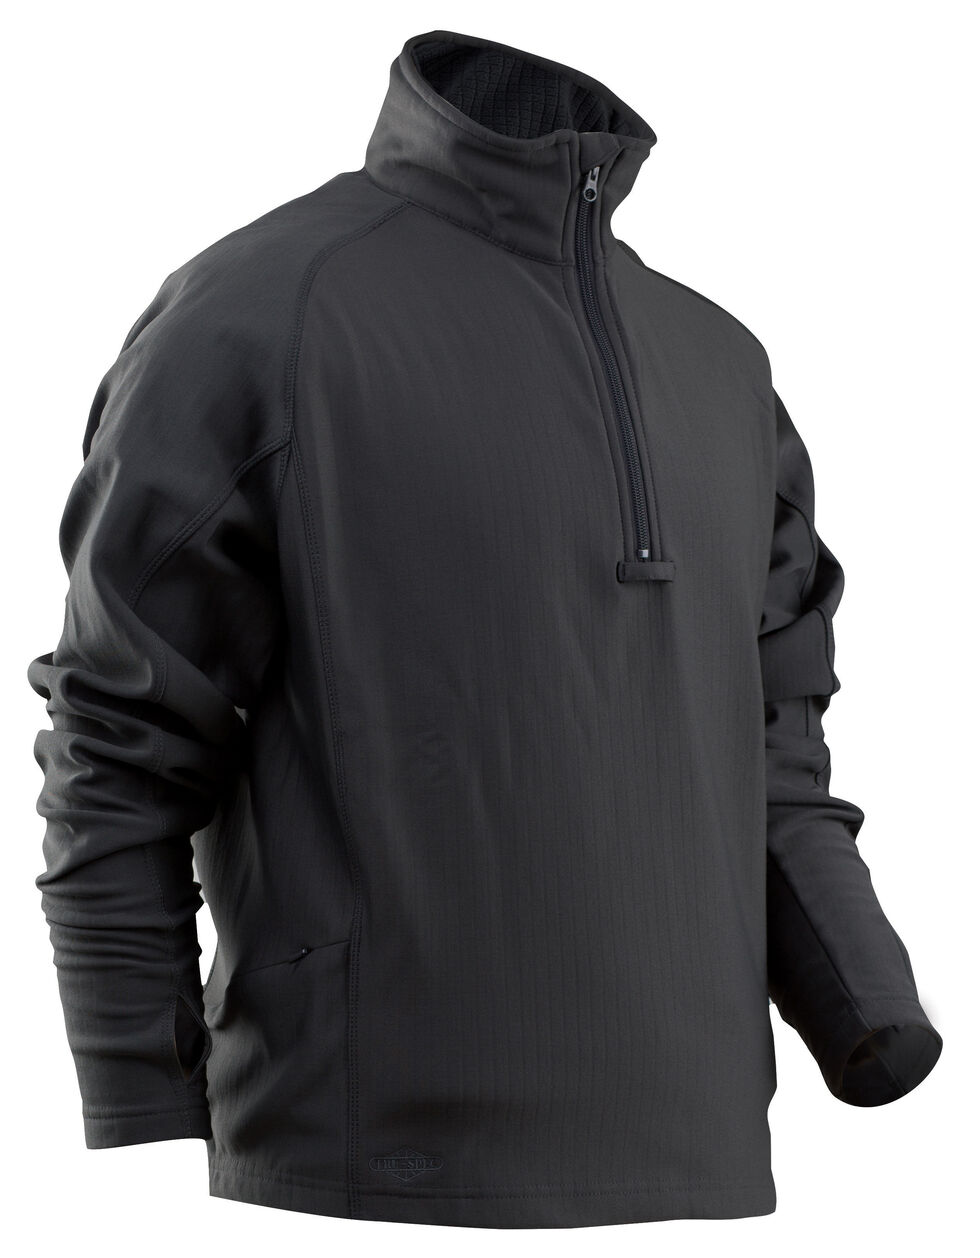 Tru-Spec 24-7 Grid Fleece Jacket, Black, hi-res